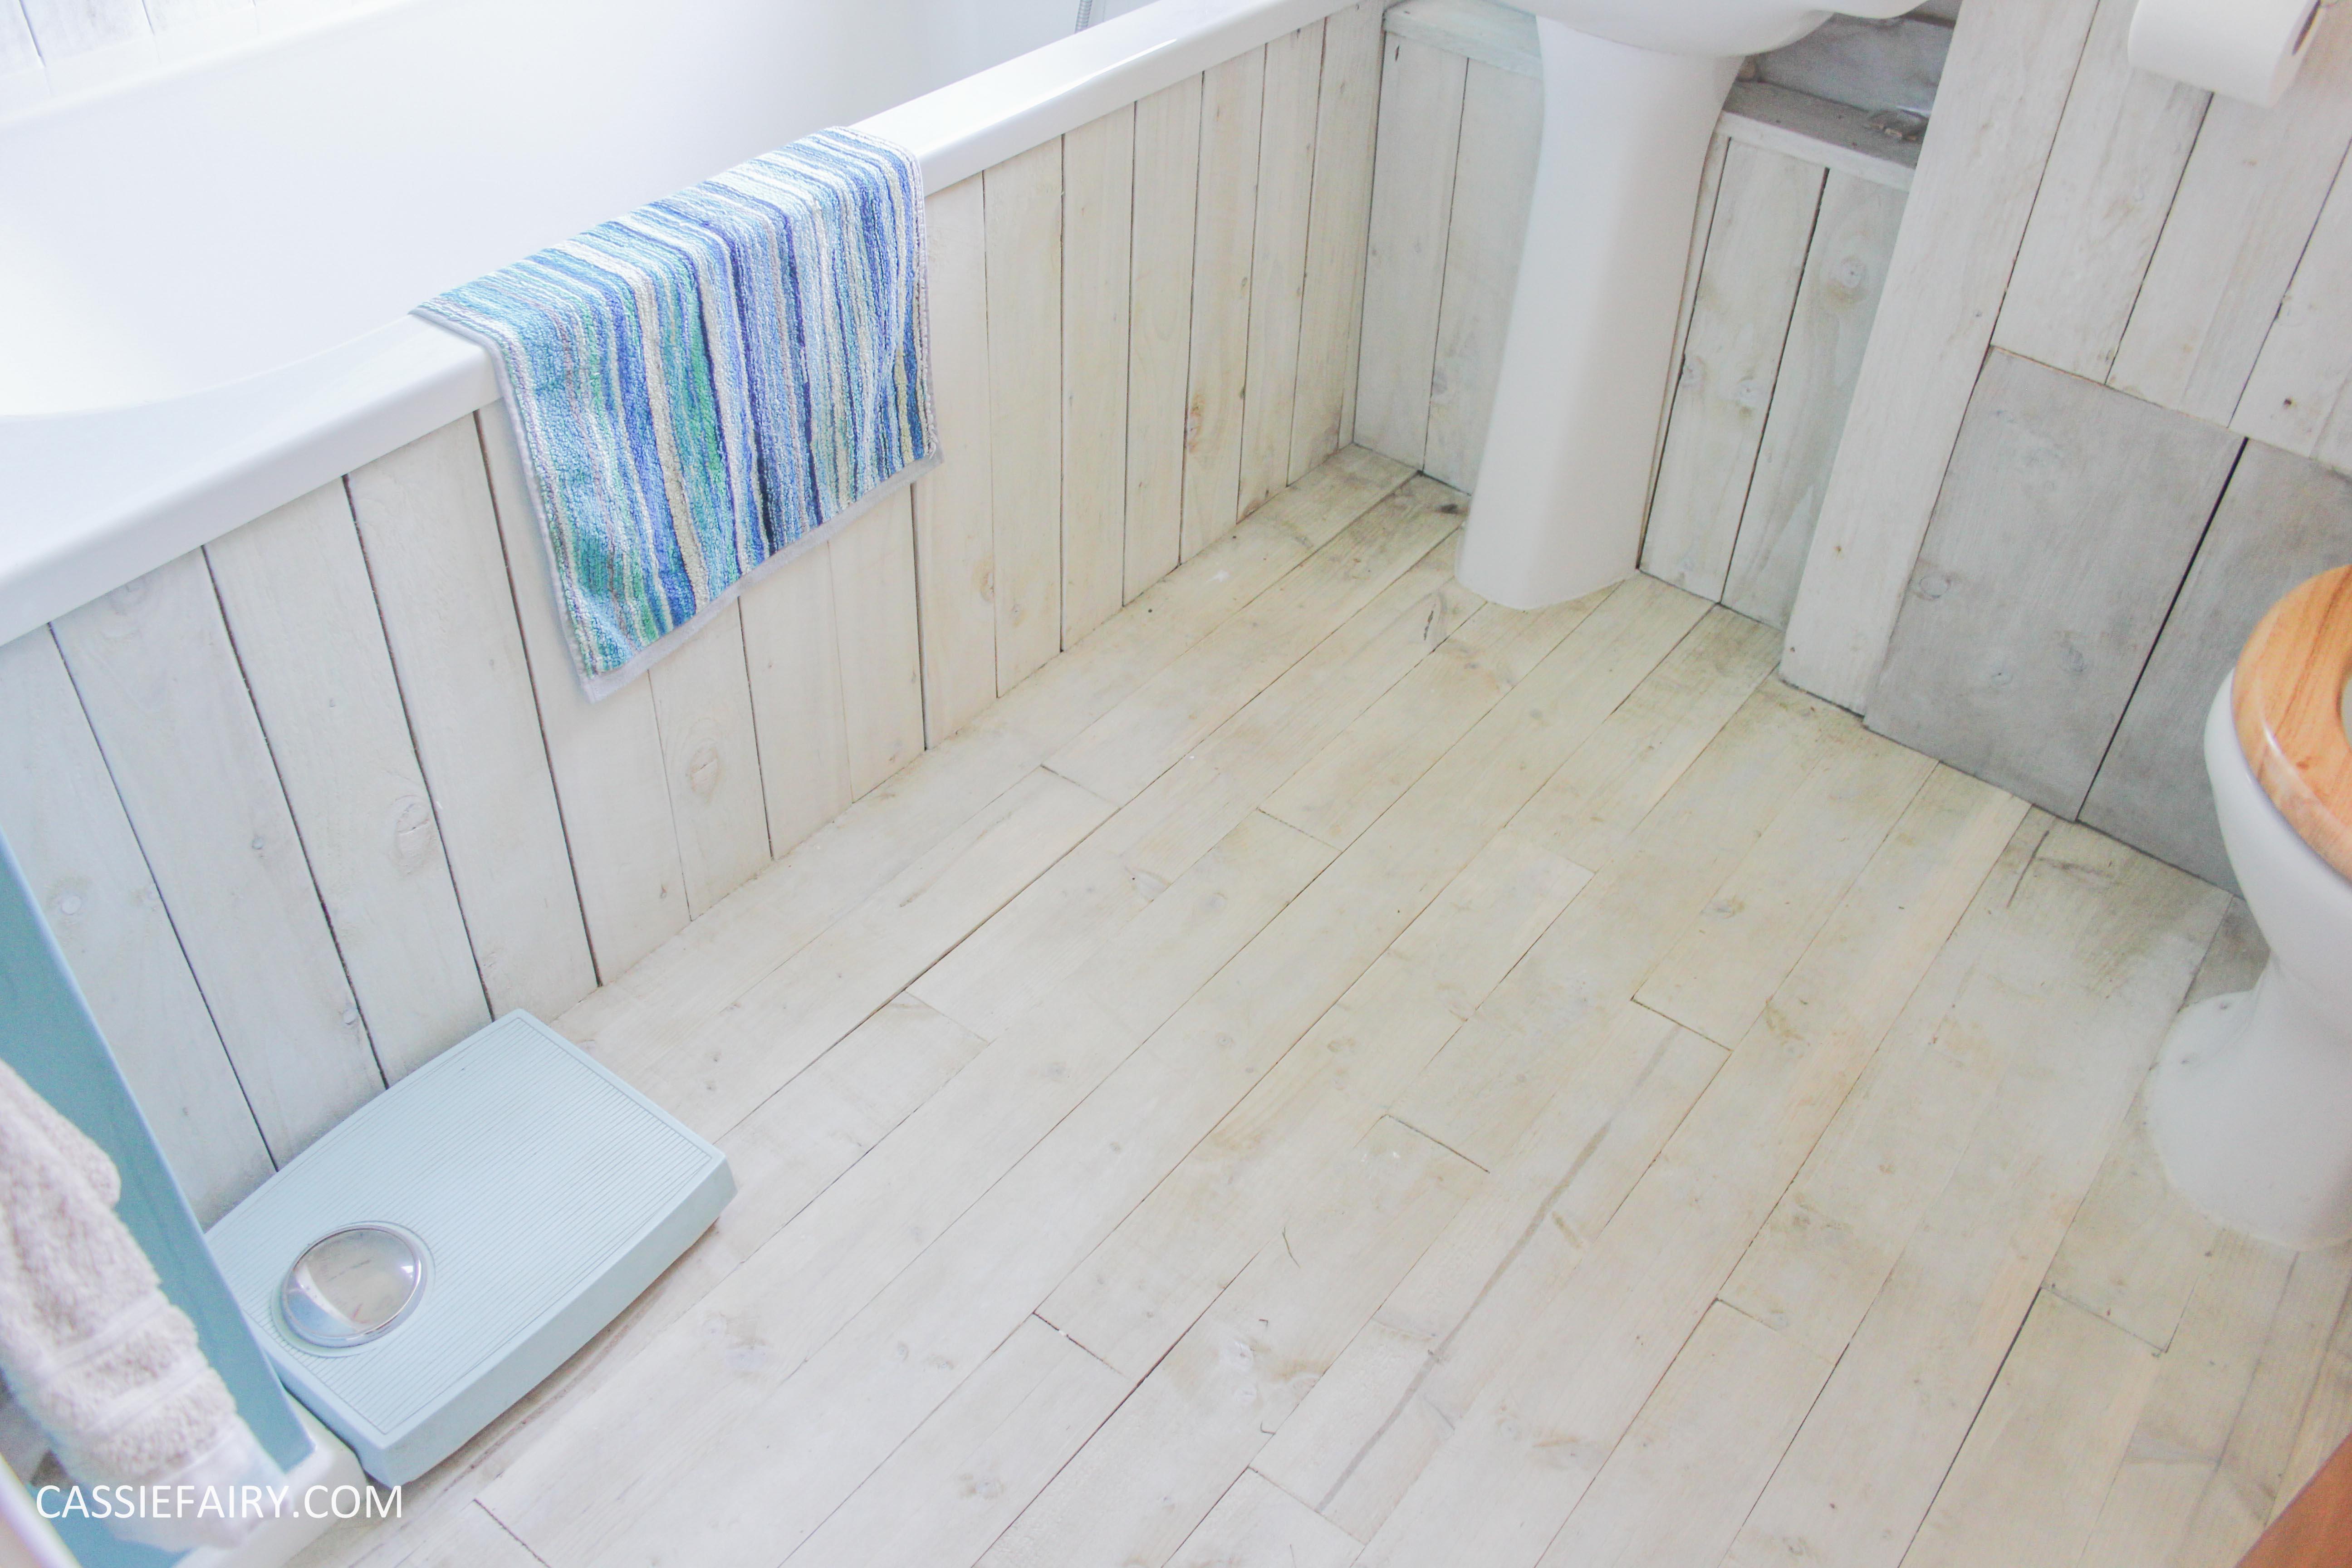 ... diy beach hut bathroom makeover project - low budget renovation-17